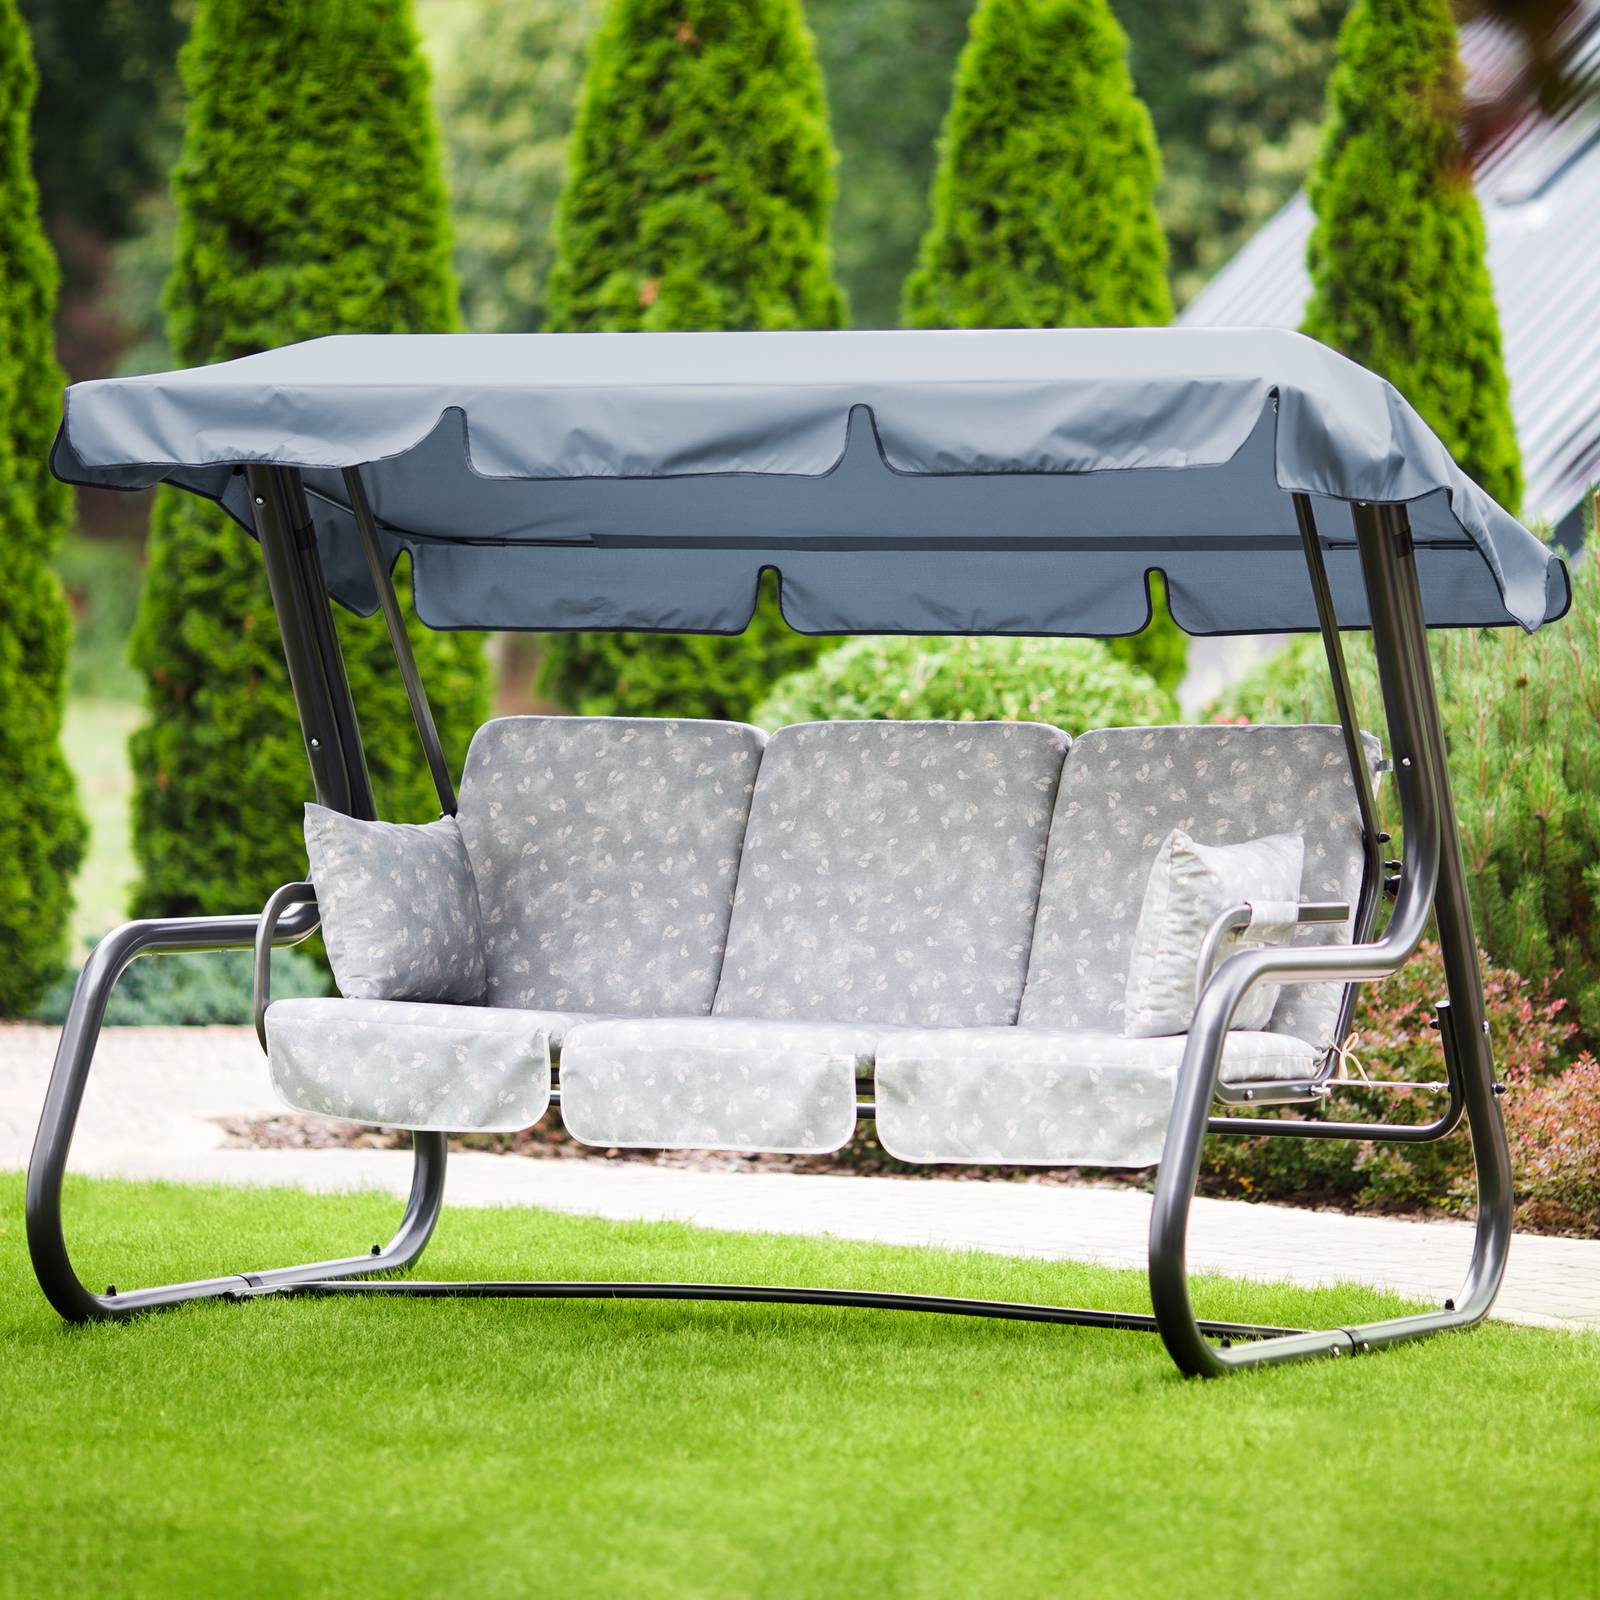 Replacement garden swing cushions 180 cm Rimini / Venezia A077-06LB PATIO